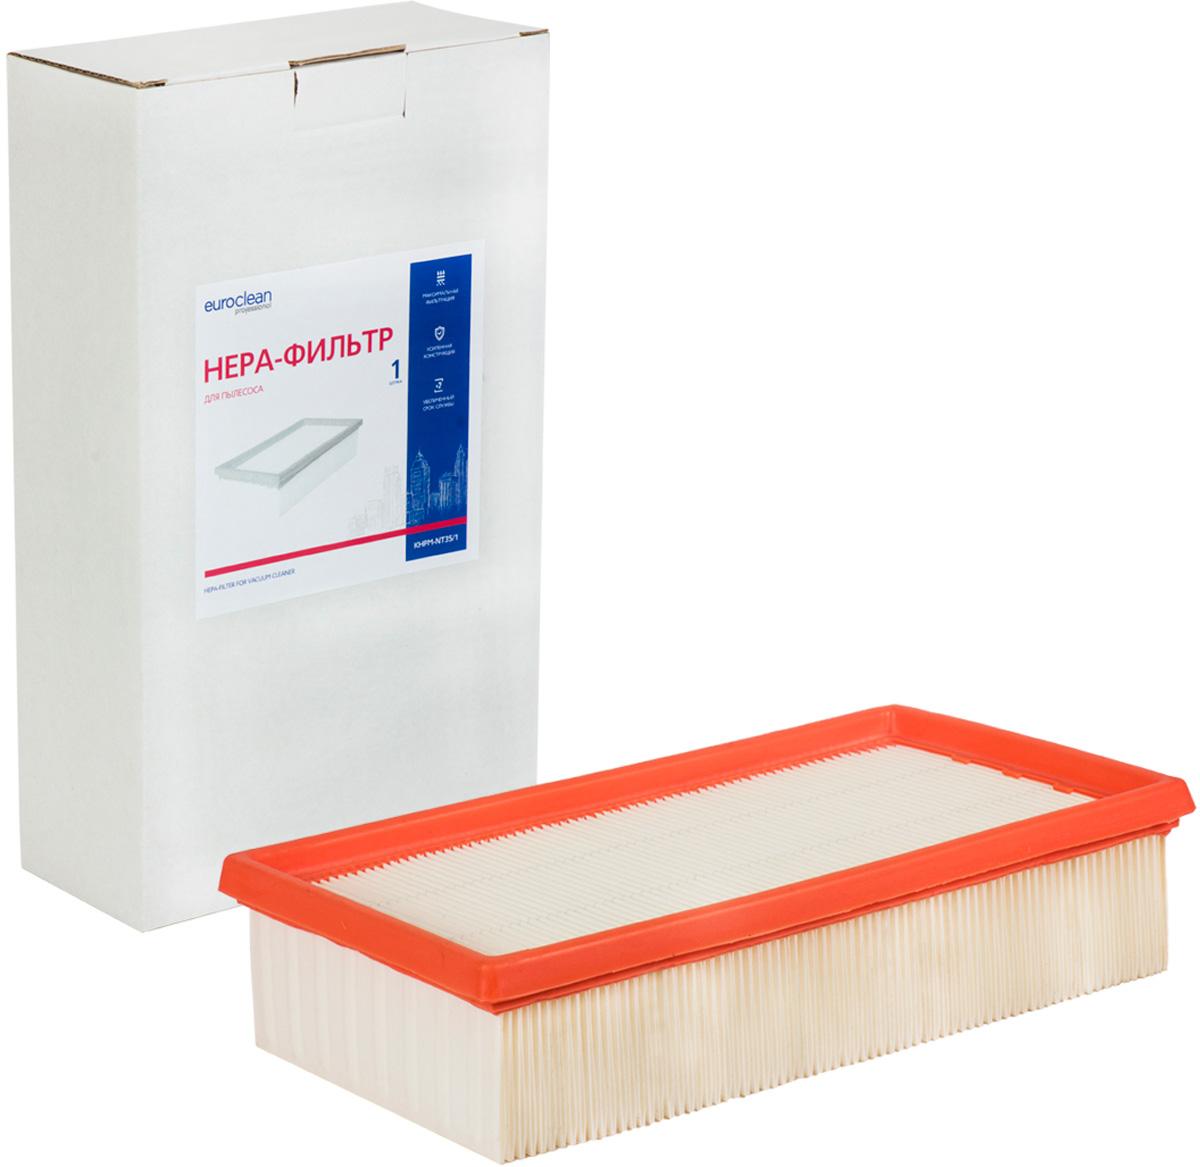 Euroclean KHPM-NT35/1 фильтр складчатый для сухой пыли к пылесосам KARCHER (аналого 6.904-367.0)